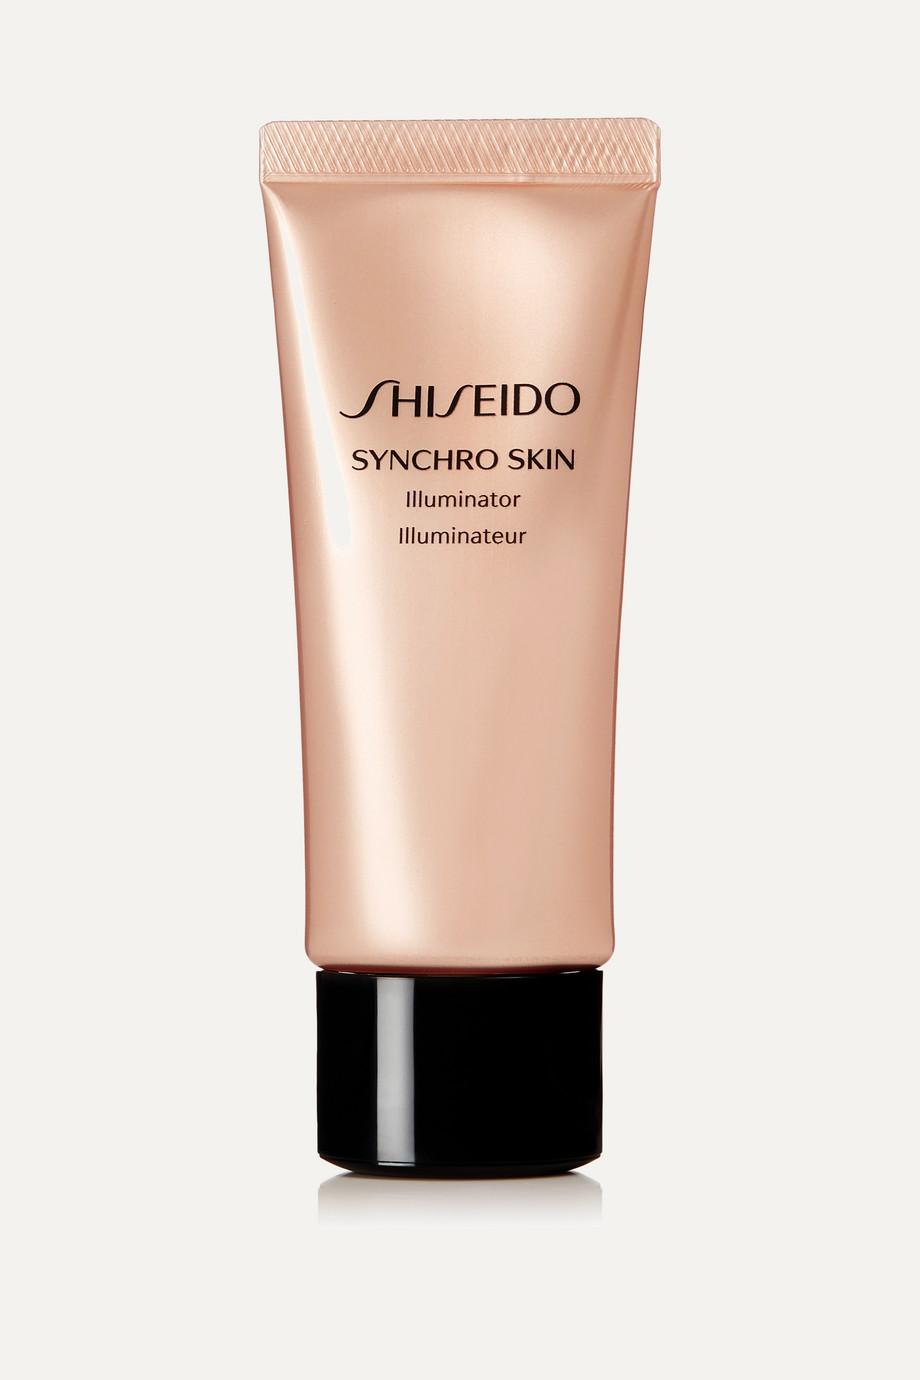 Shiseido Synchro Skin Illuminator - Rose Gold, 40ml